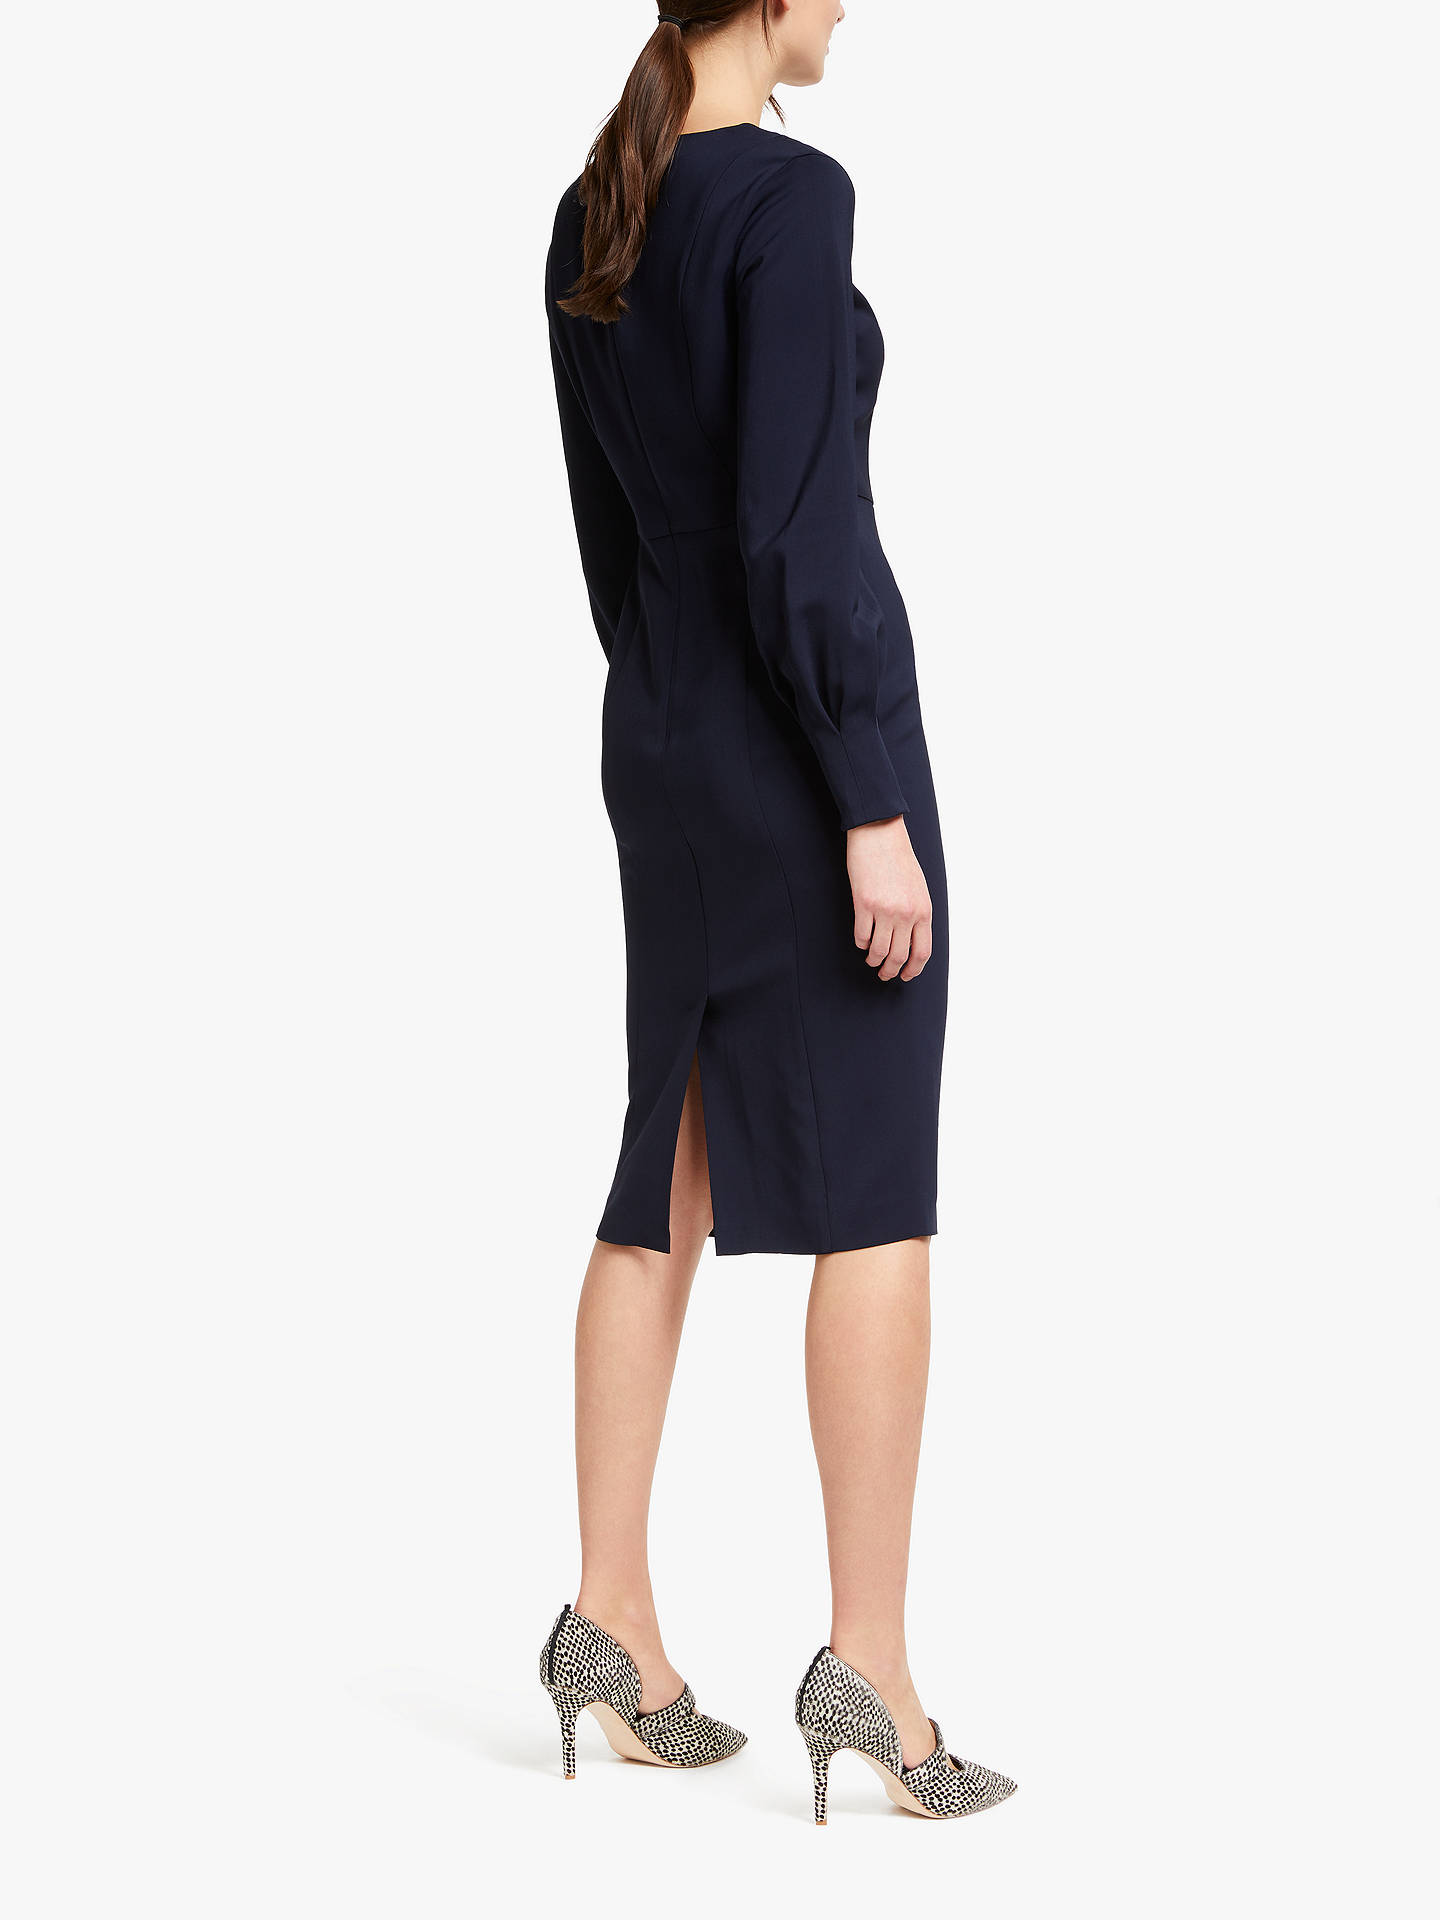 b6da2396509 ... Buy Boden Hannah Dress, Navy, 8 Online at johnlewis.com